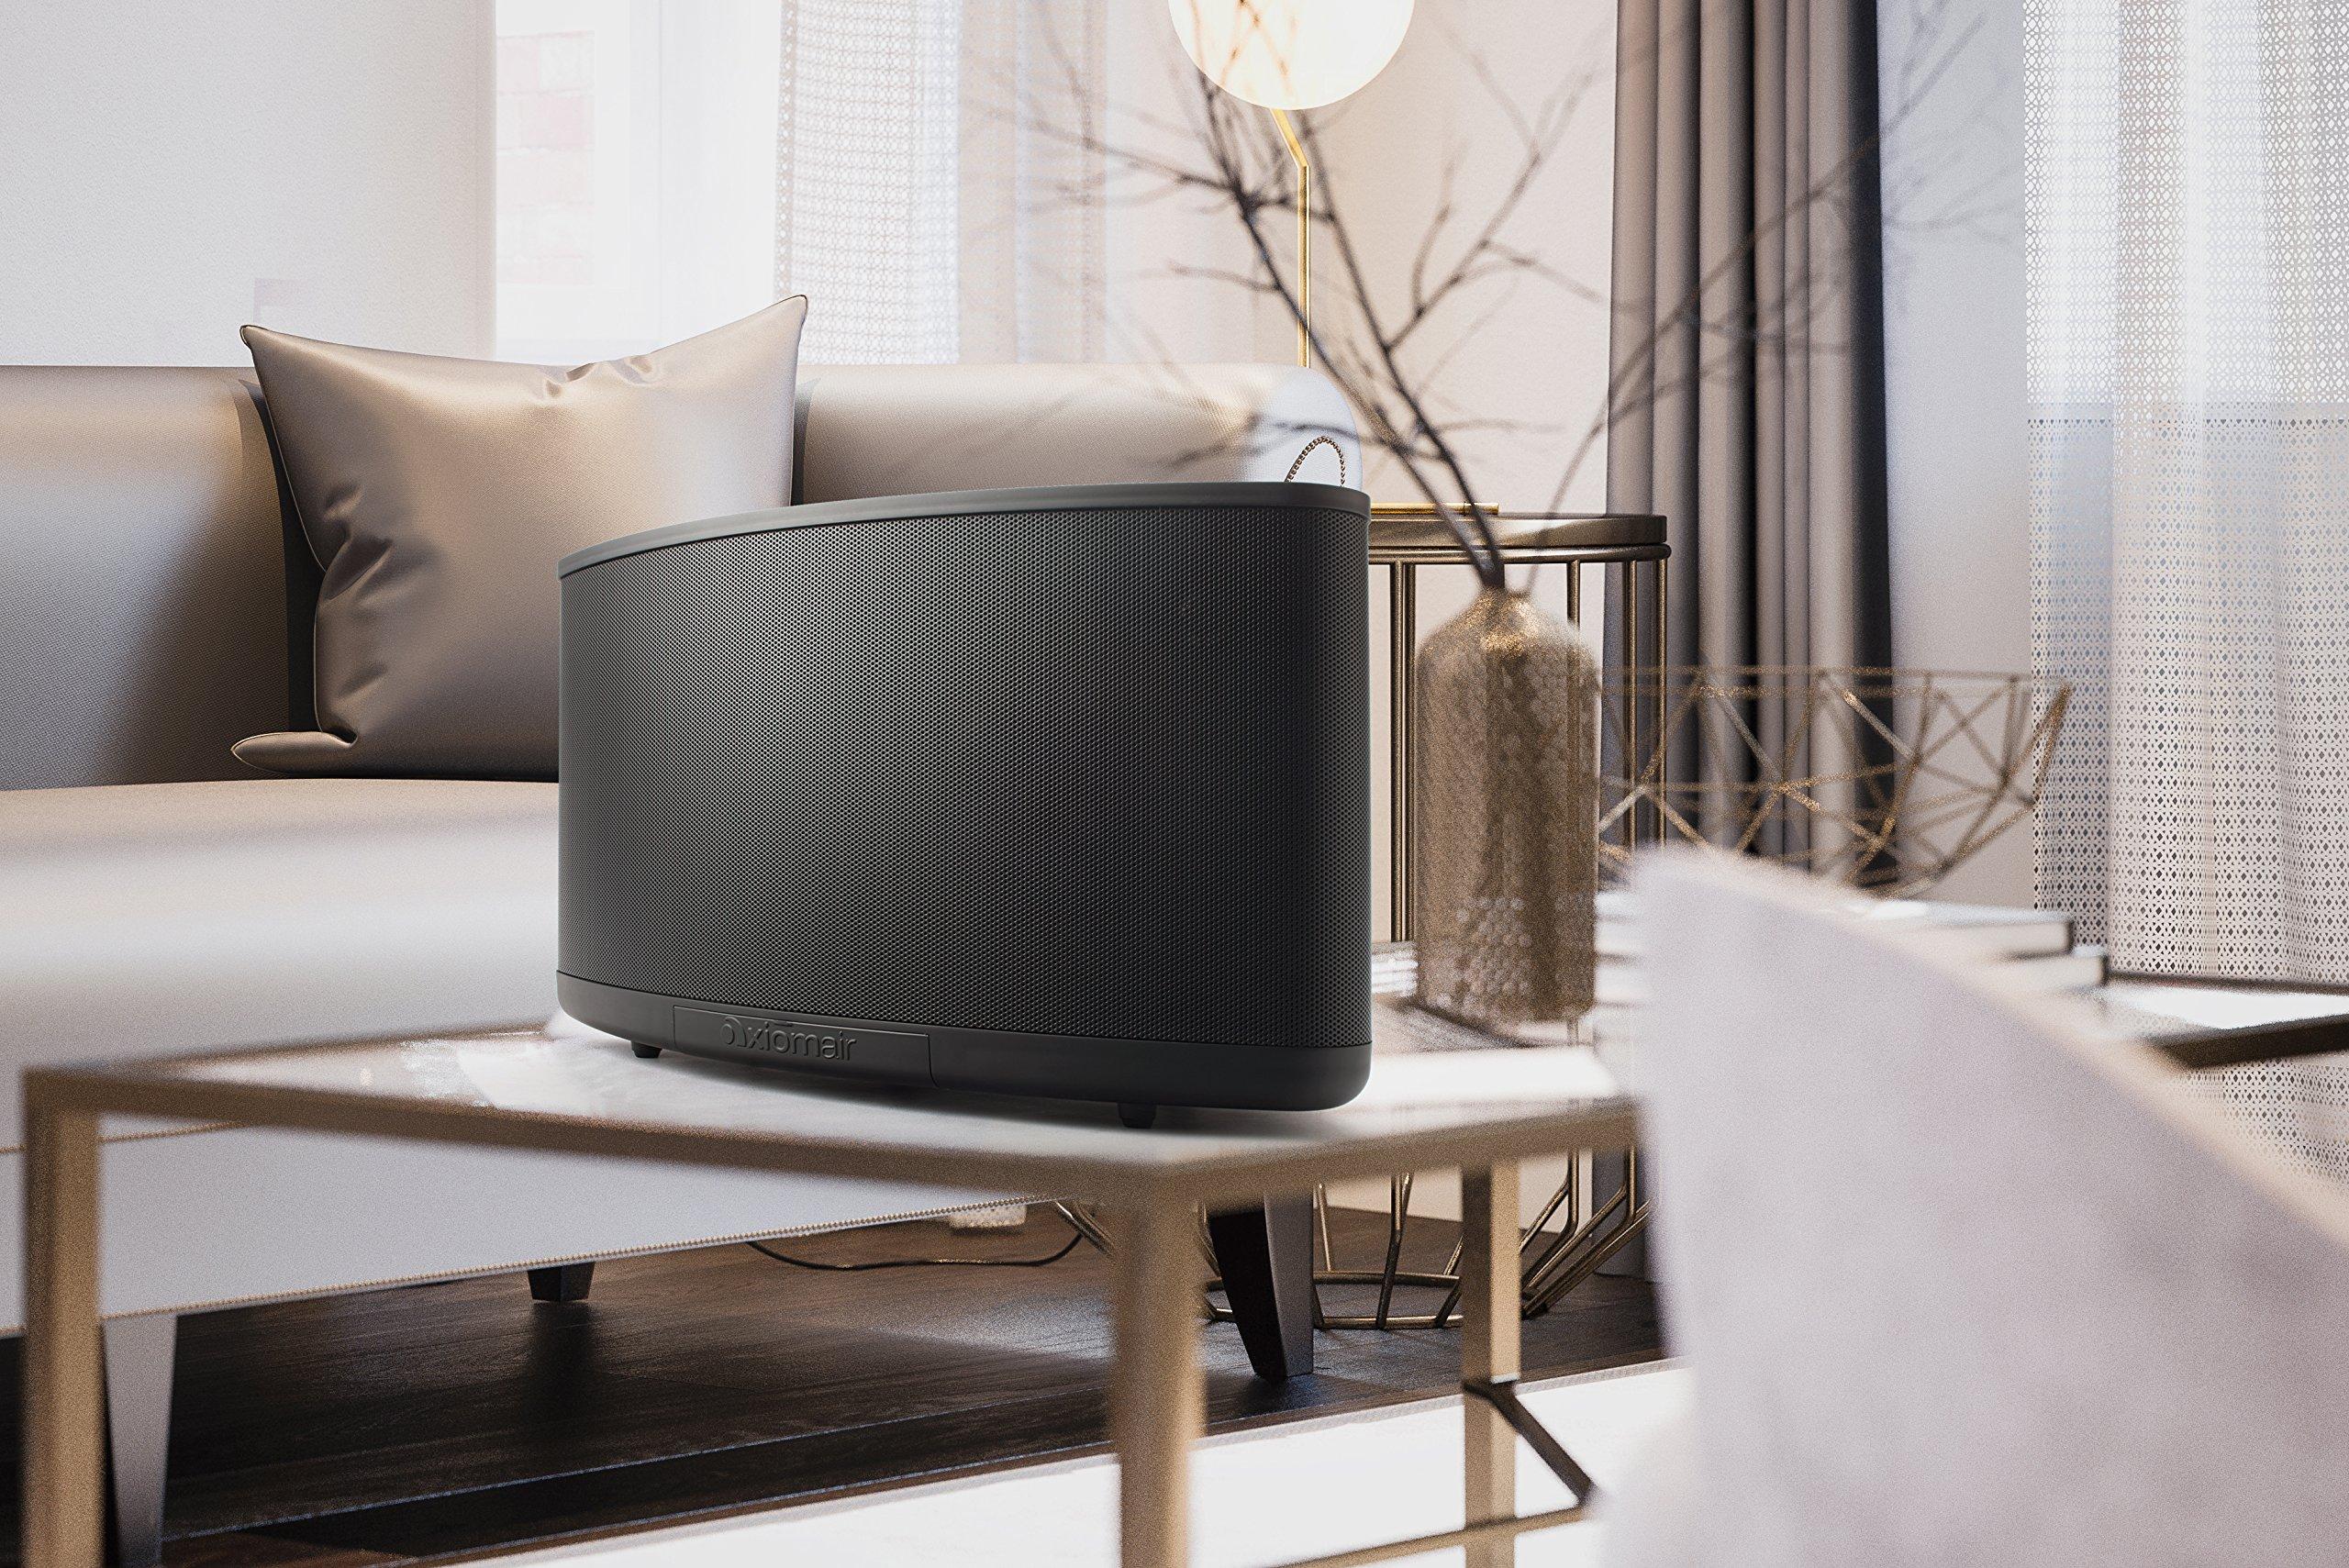 AxiomAir Portable Wireless Wifi Speaker - Airplay Enabled 150-Watt Audiophile Quality Speaker by Axiom (Image #7)